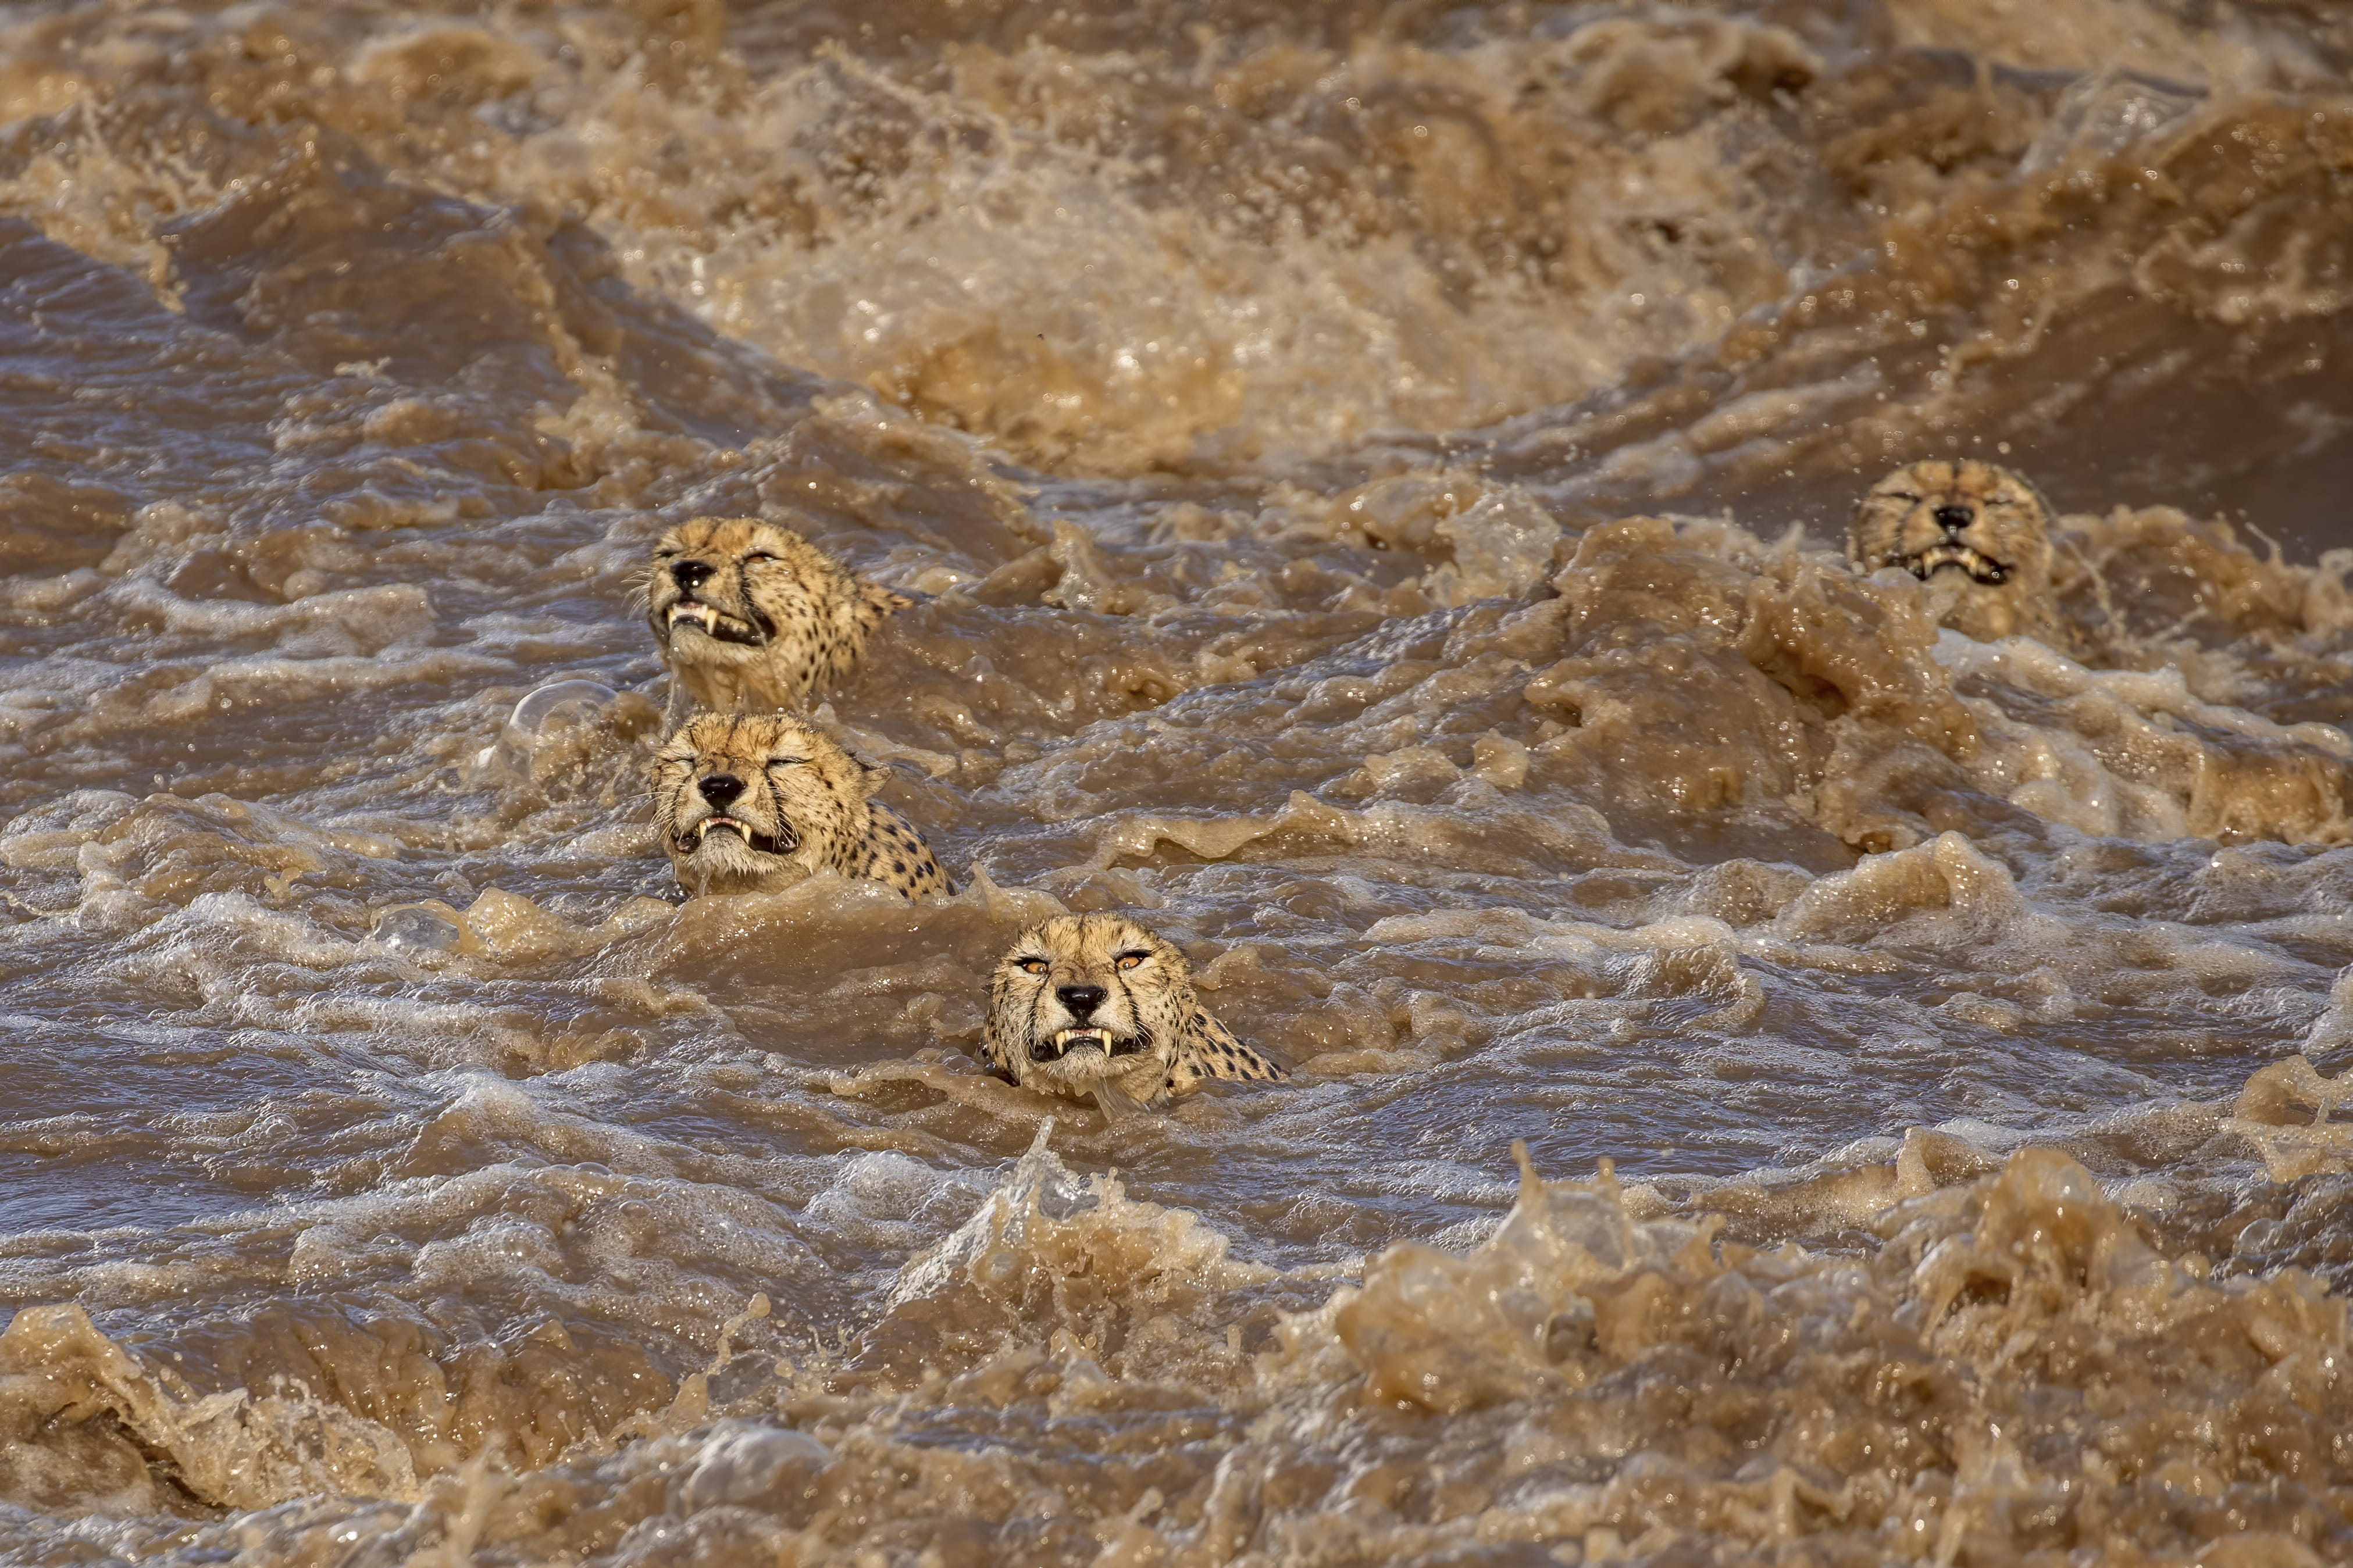 Cheetahs crossing the raging Talek River in Kenya. © Buddhilini de Soyza, Wildlife Photographer of the Year